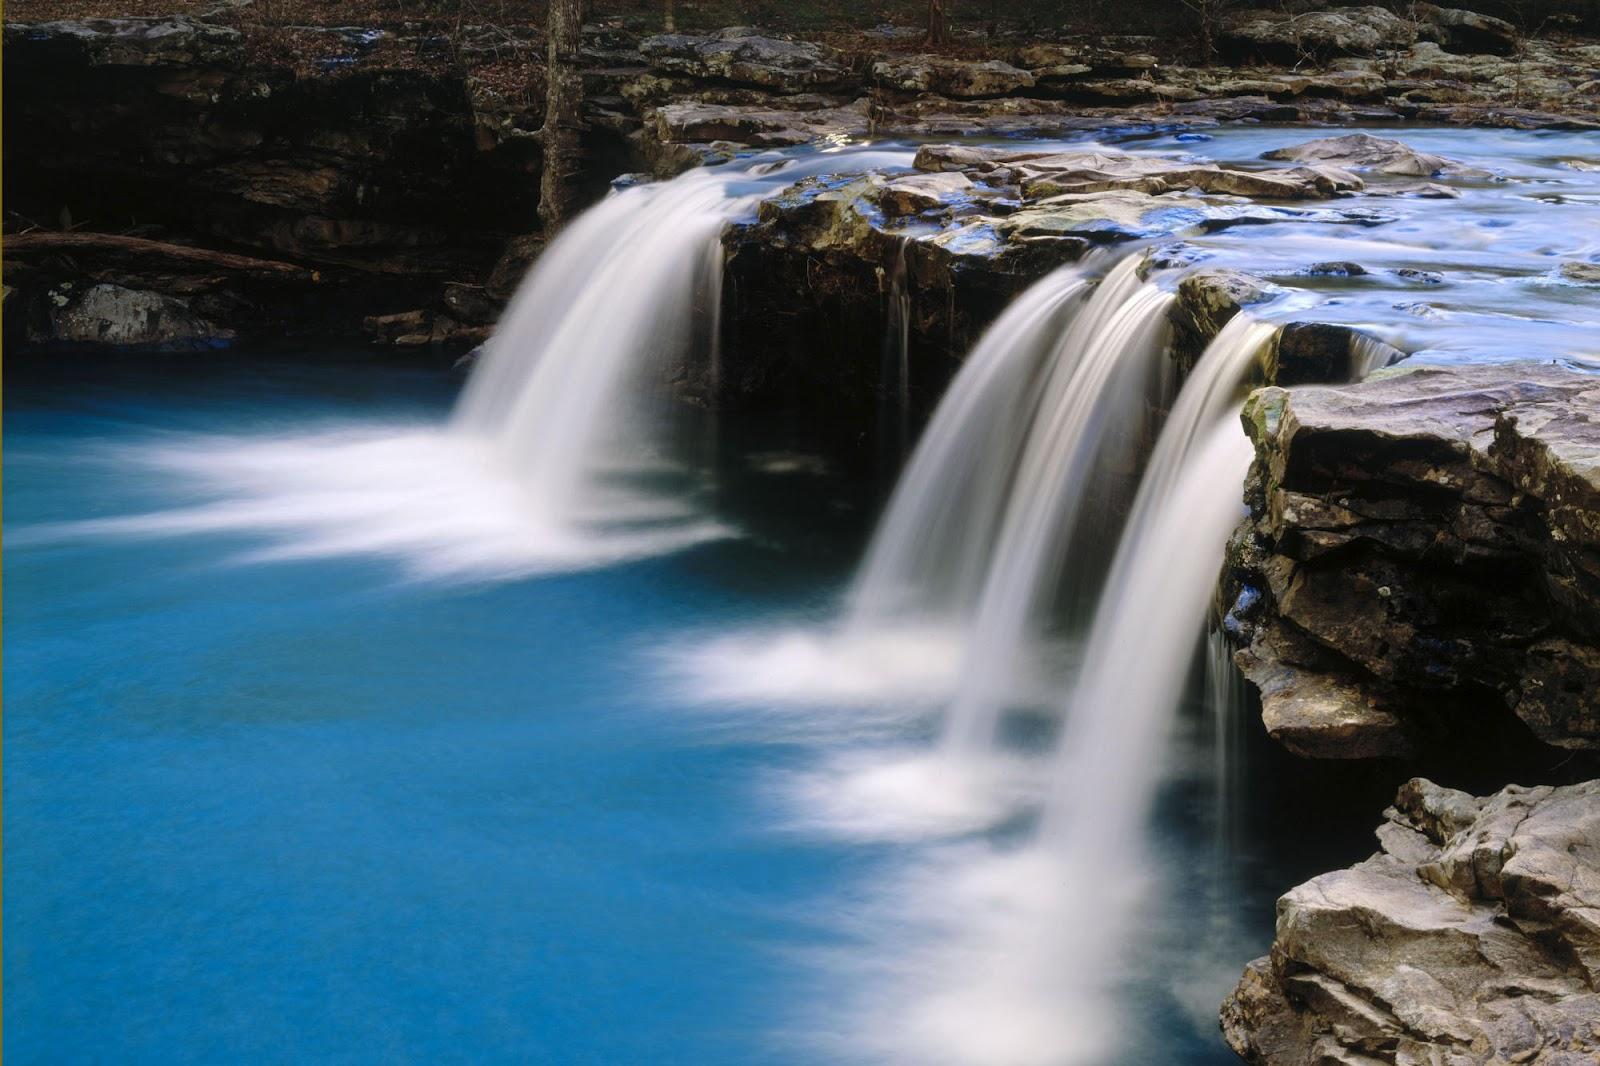 Falling Water Wallpaper Free Download Best Waterfall Wallpaper Pack For Best Laptop Wall2u